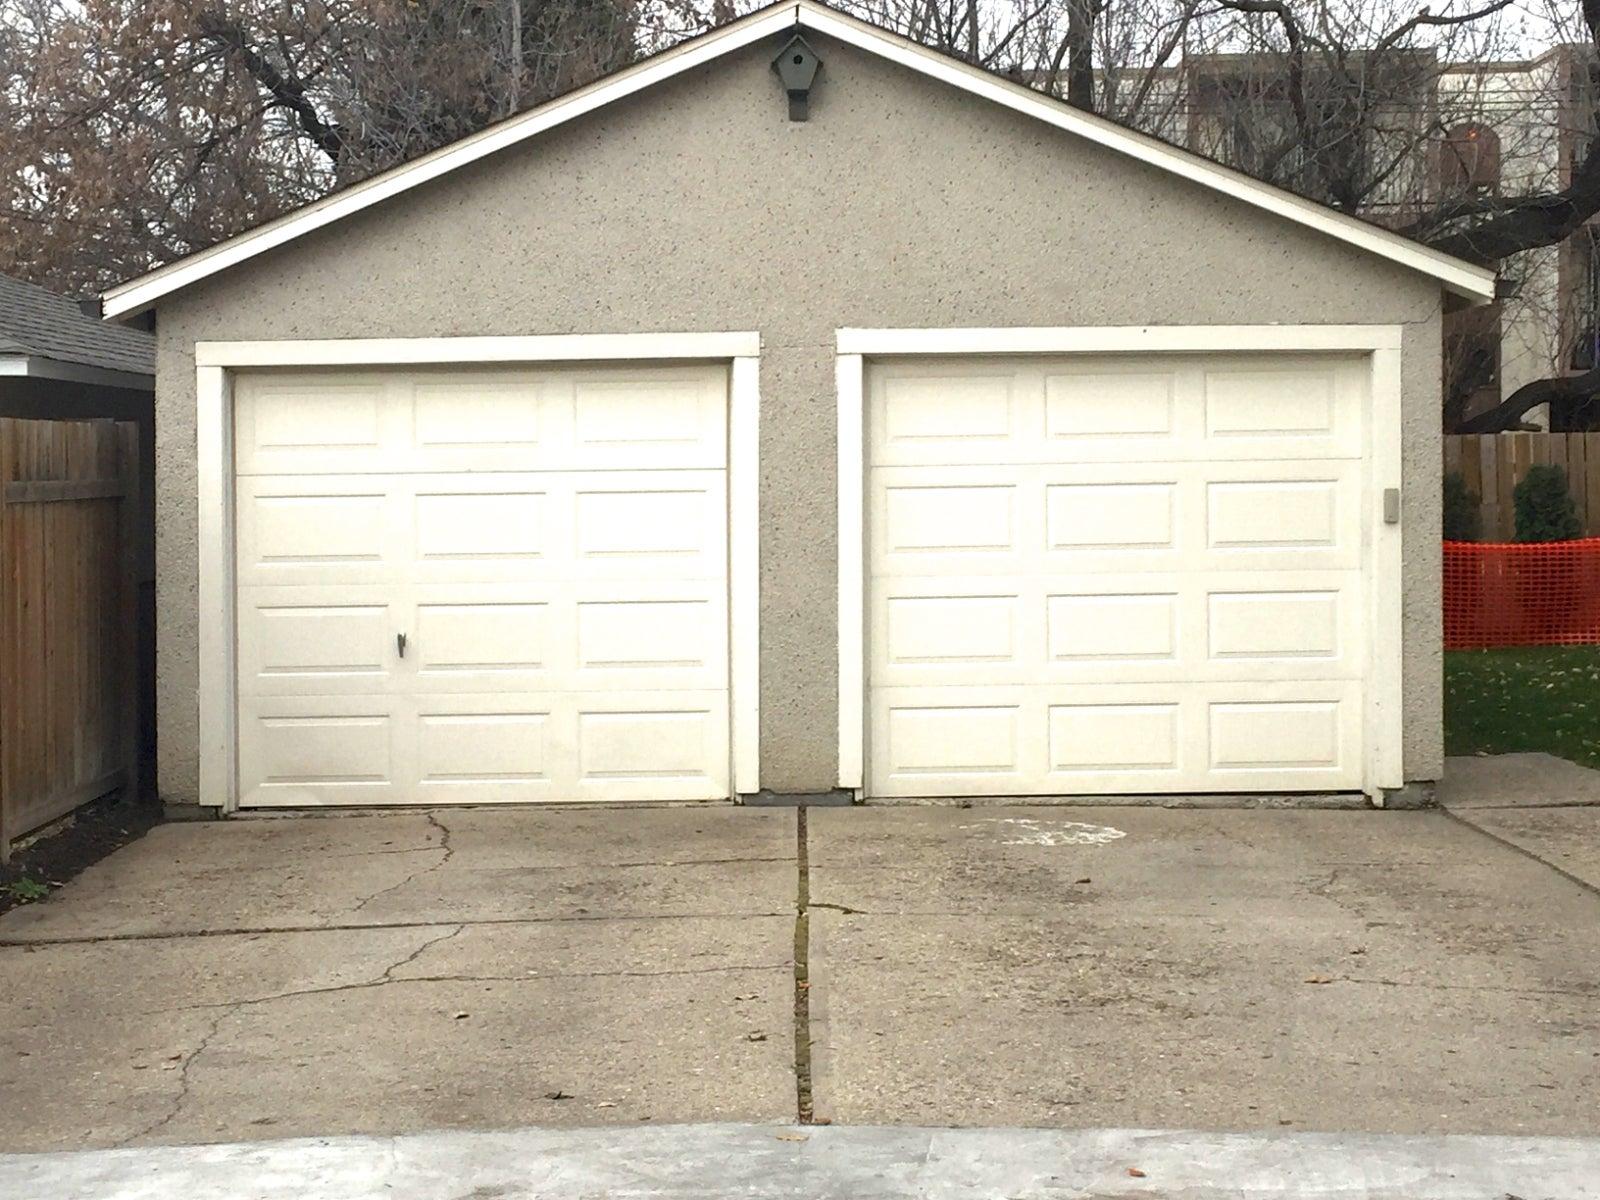 5533 45 Ave, Red Deer, AB  T4N 3L7 - Waskasoo Detached for sale #2